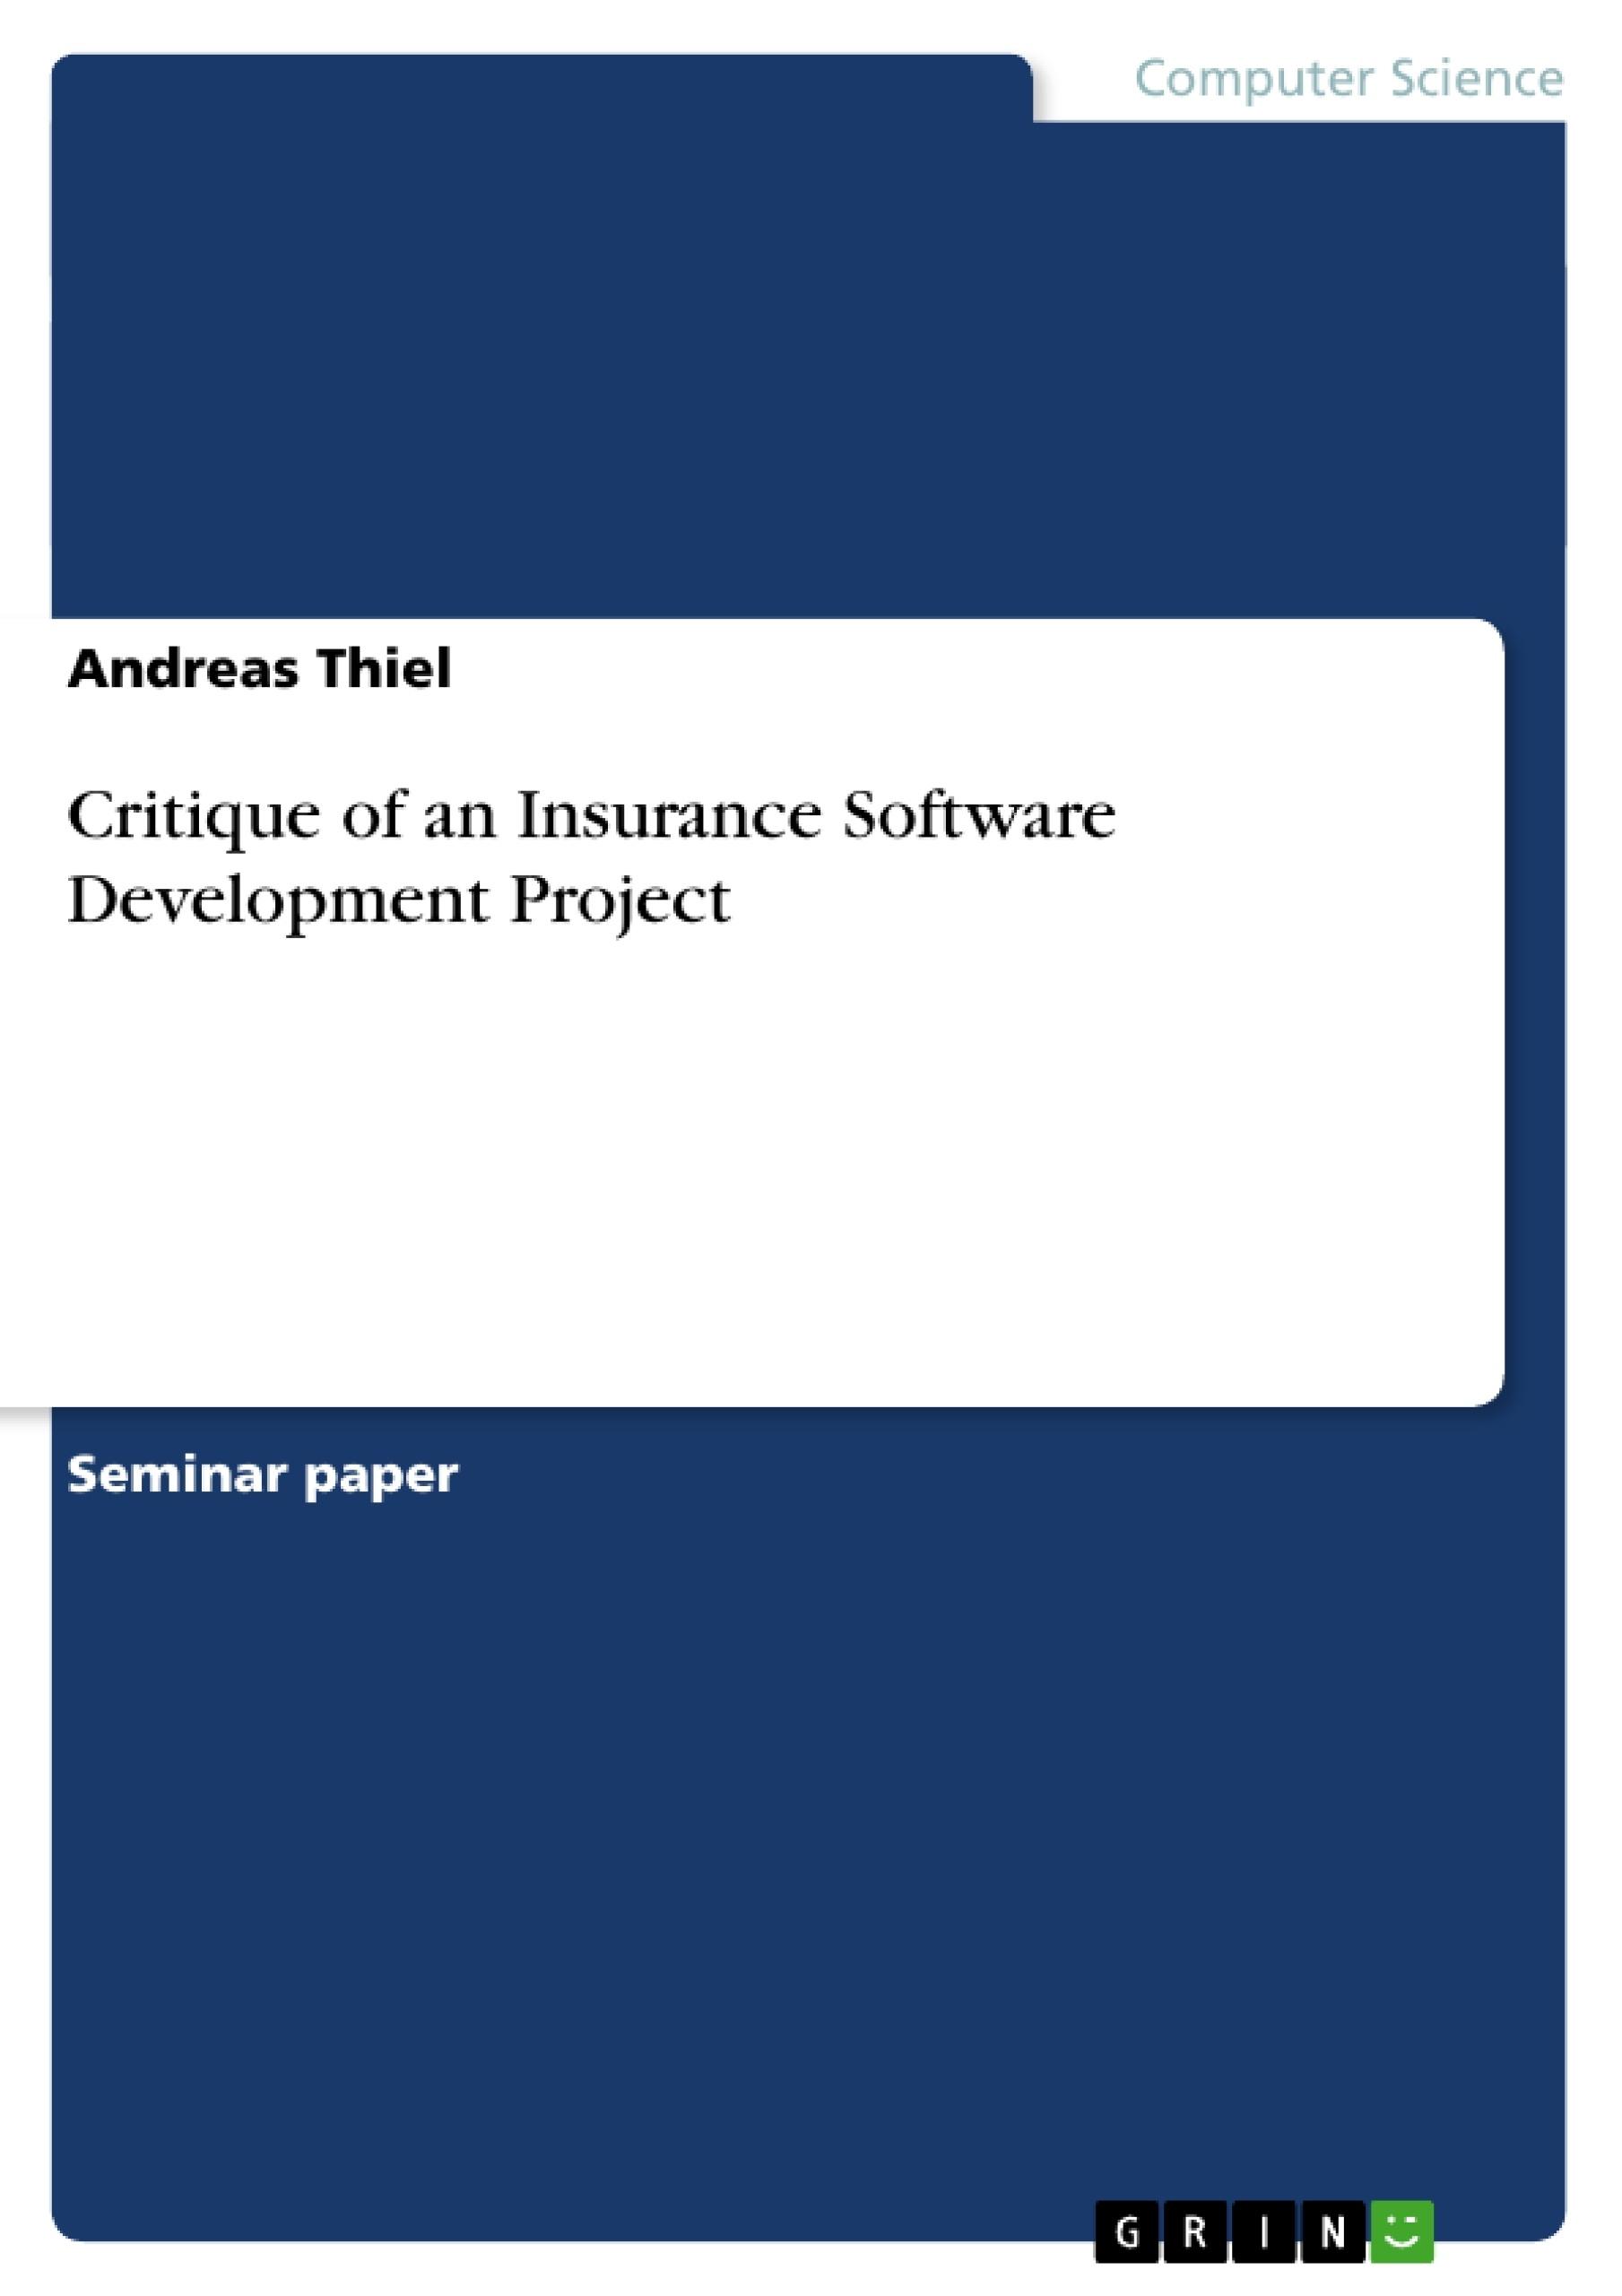 Title: Critique of an Insurance Software Development Project